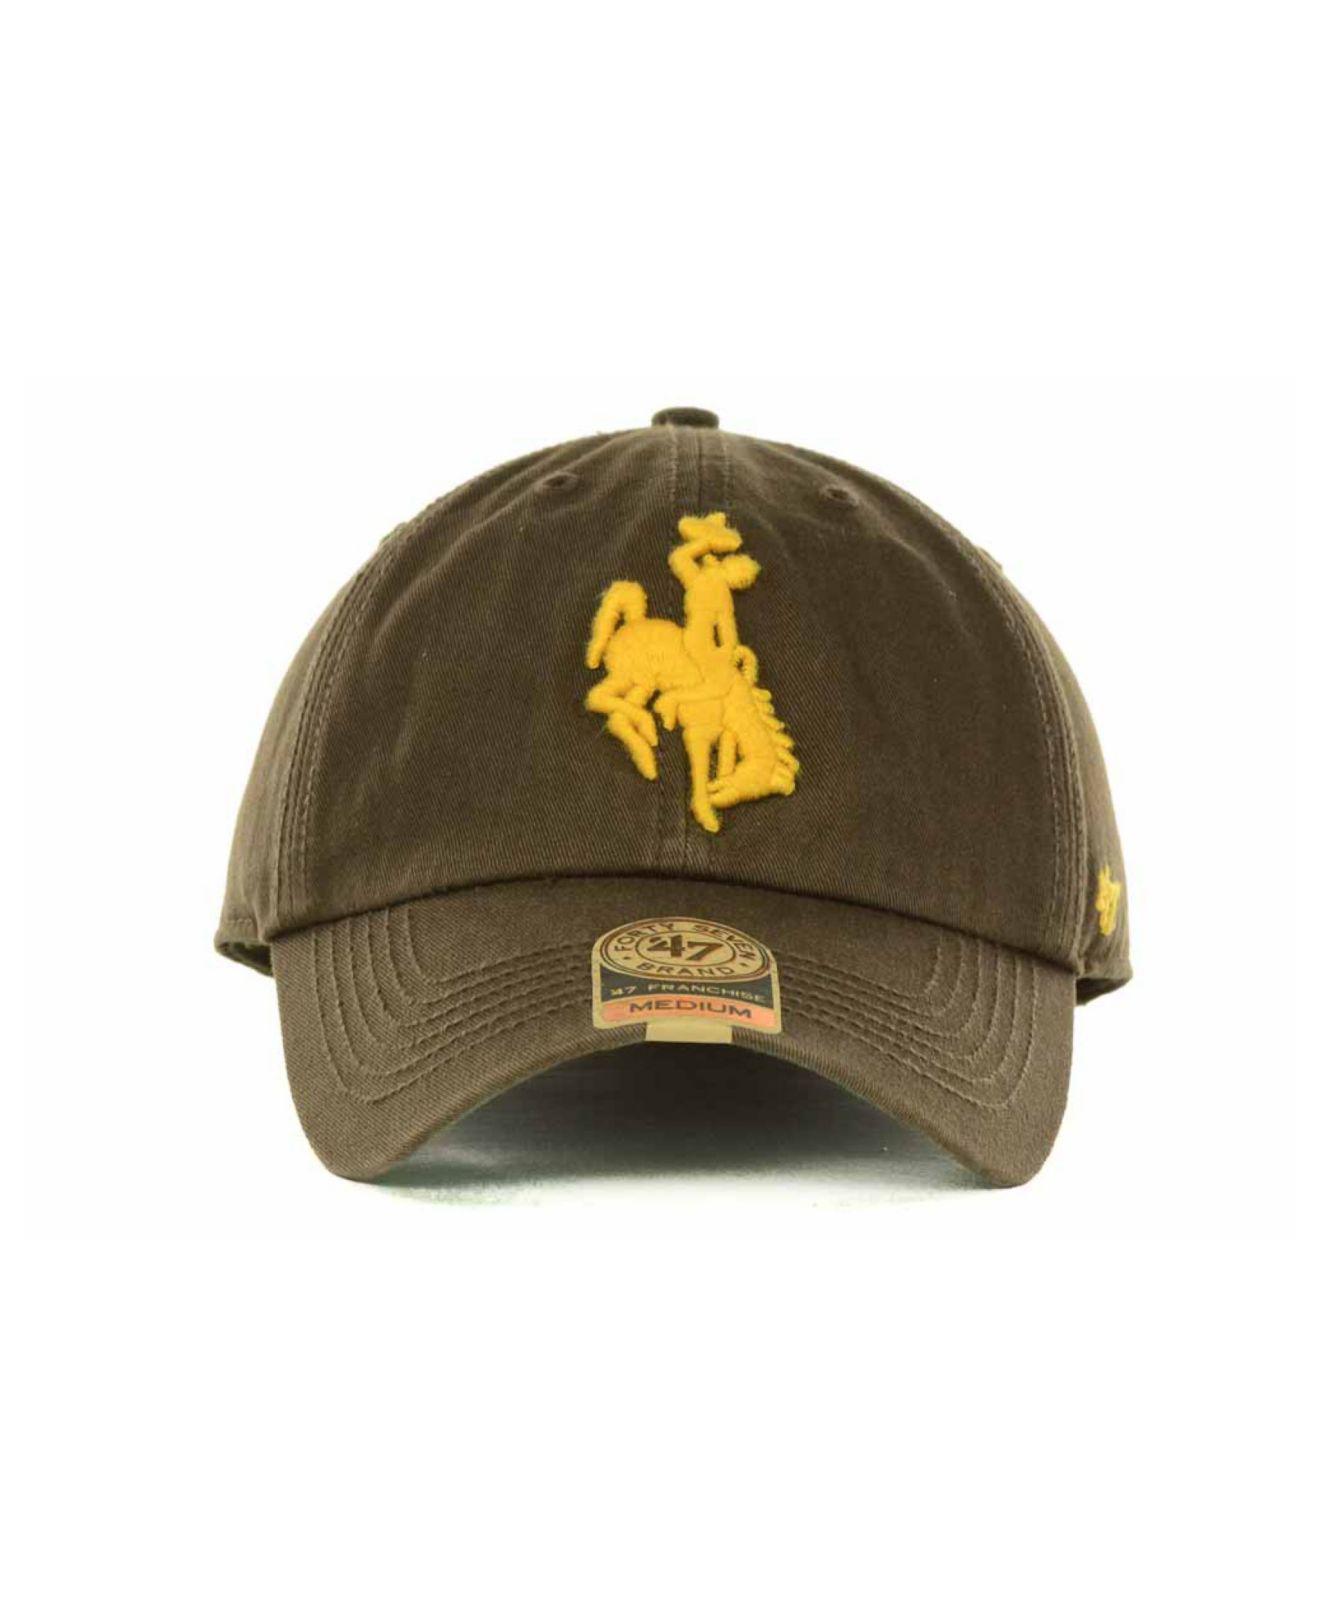 Men's Brown Wyoming Cowboys Franchise Cap